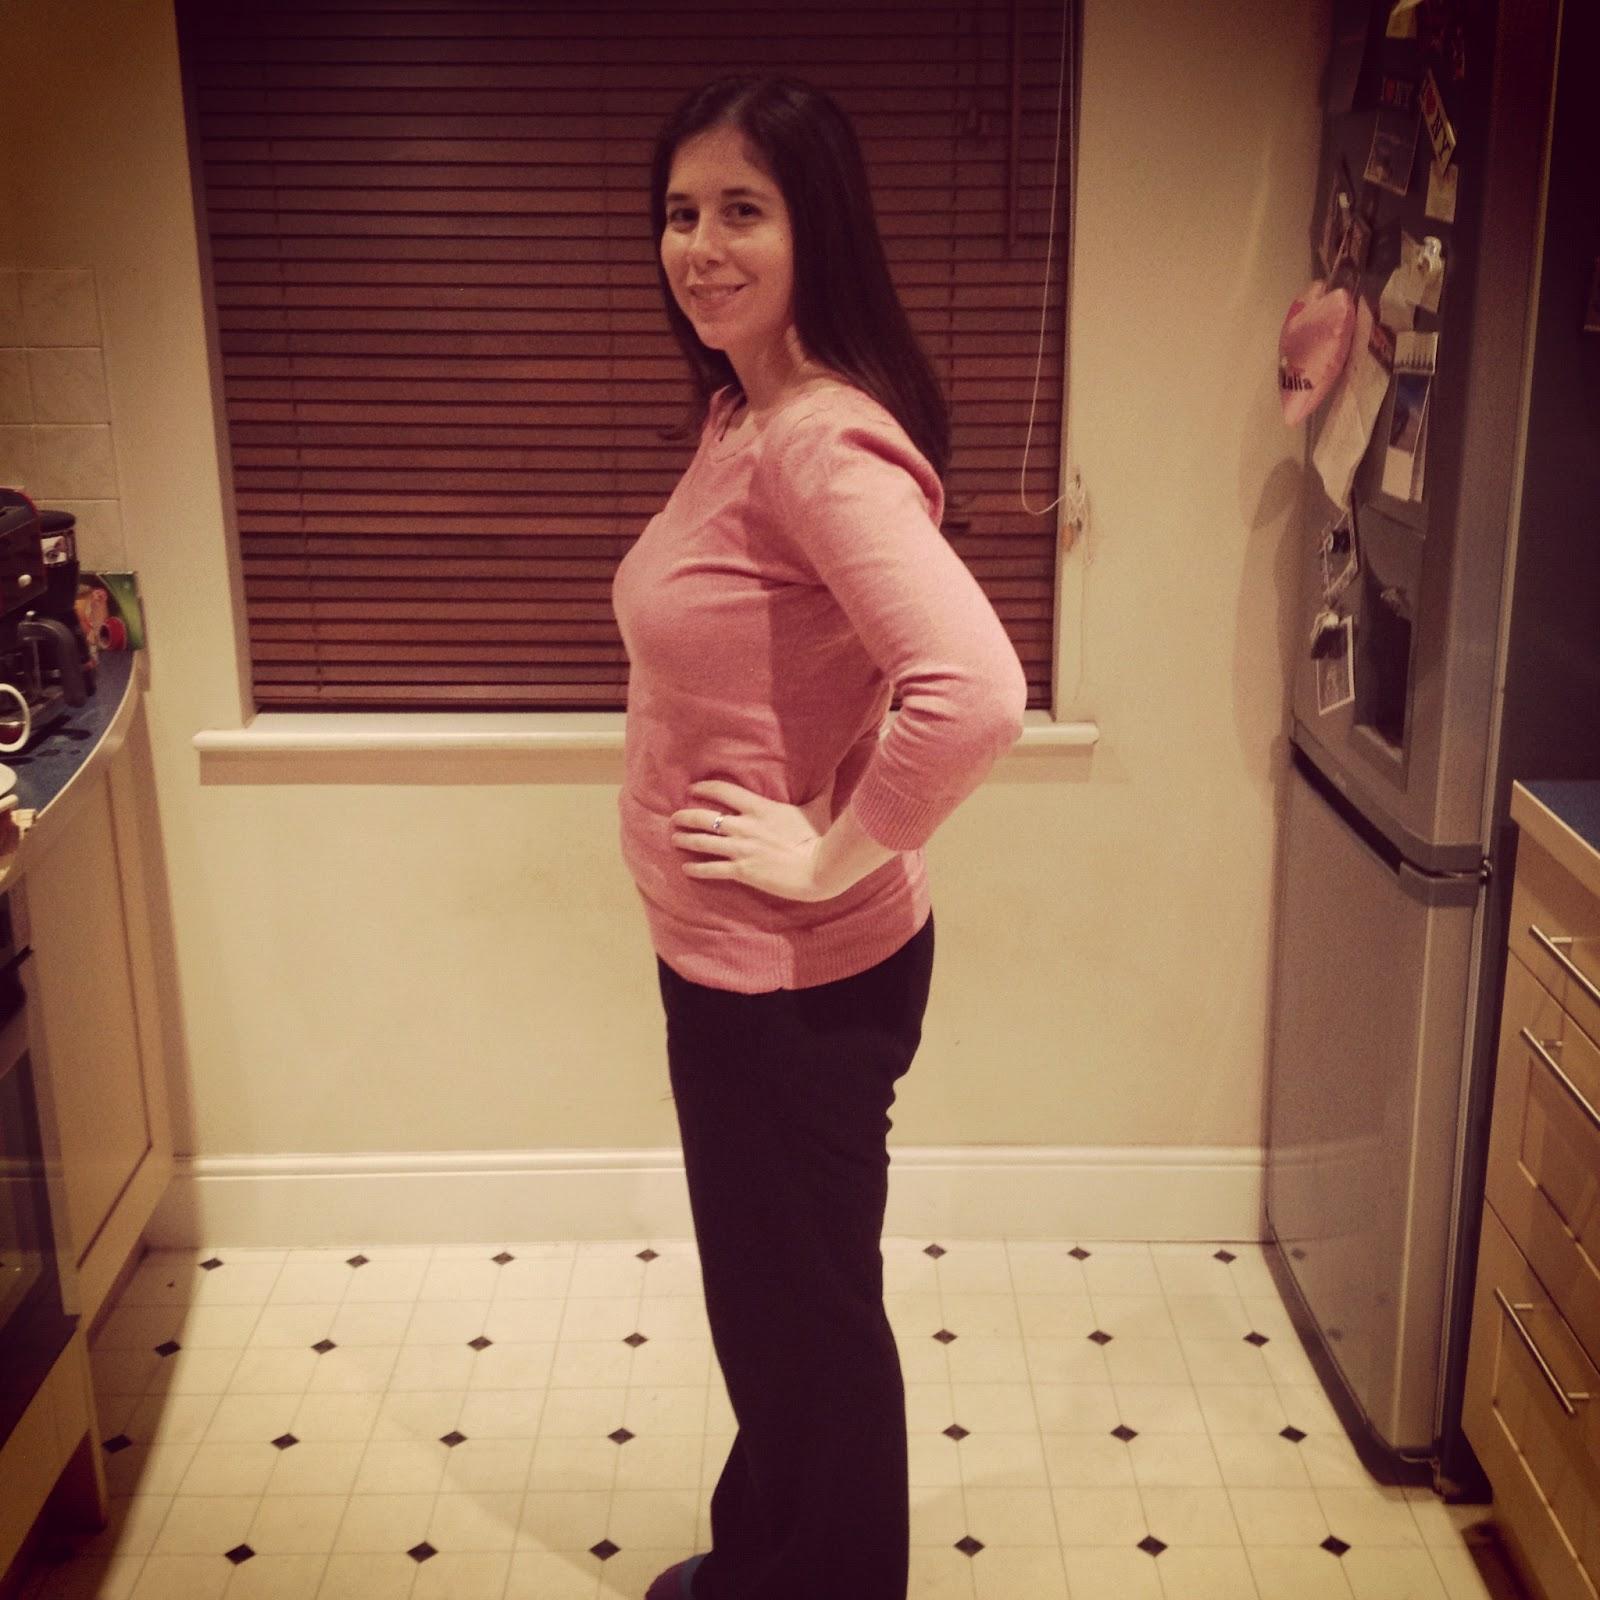 birth of a mum: twenty-five weeks pregnant